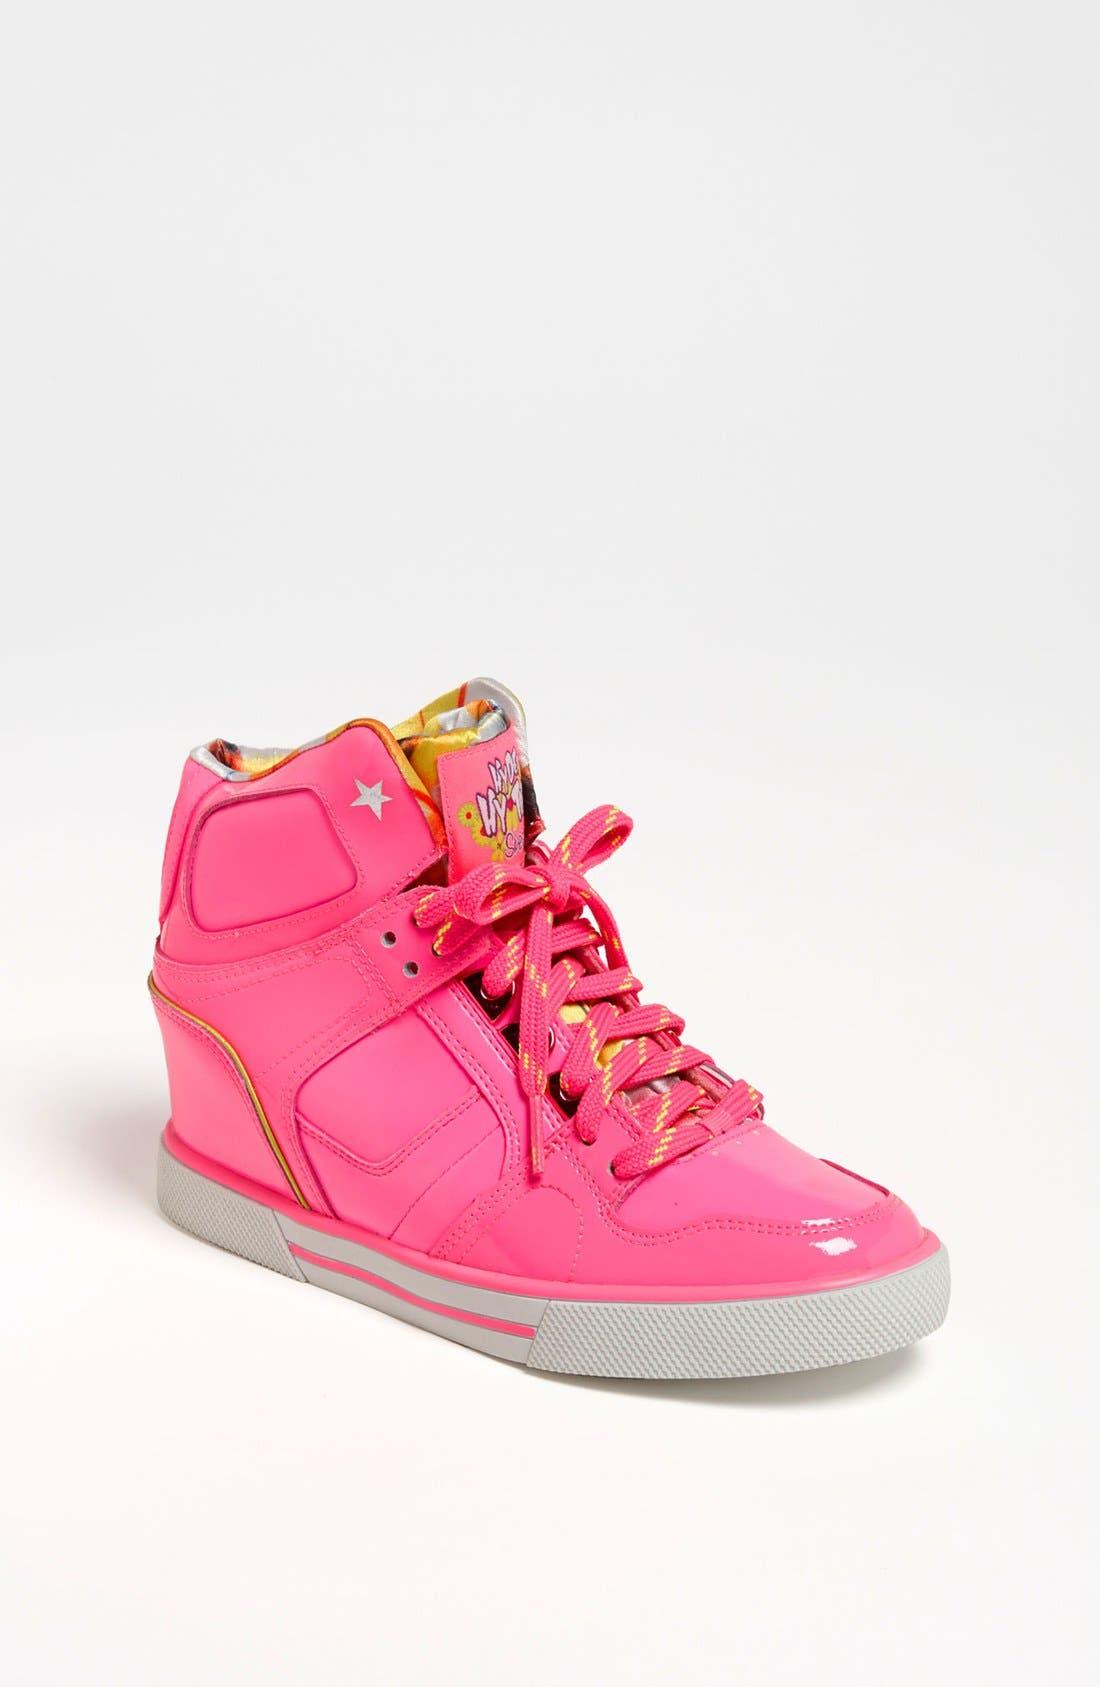 Main Image - SKECHERS 'Hydee Hytop Cha-Ching' Sneaker (Toddler, Little Kid & Big Kid)